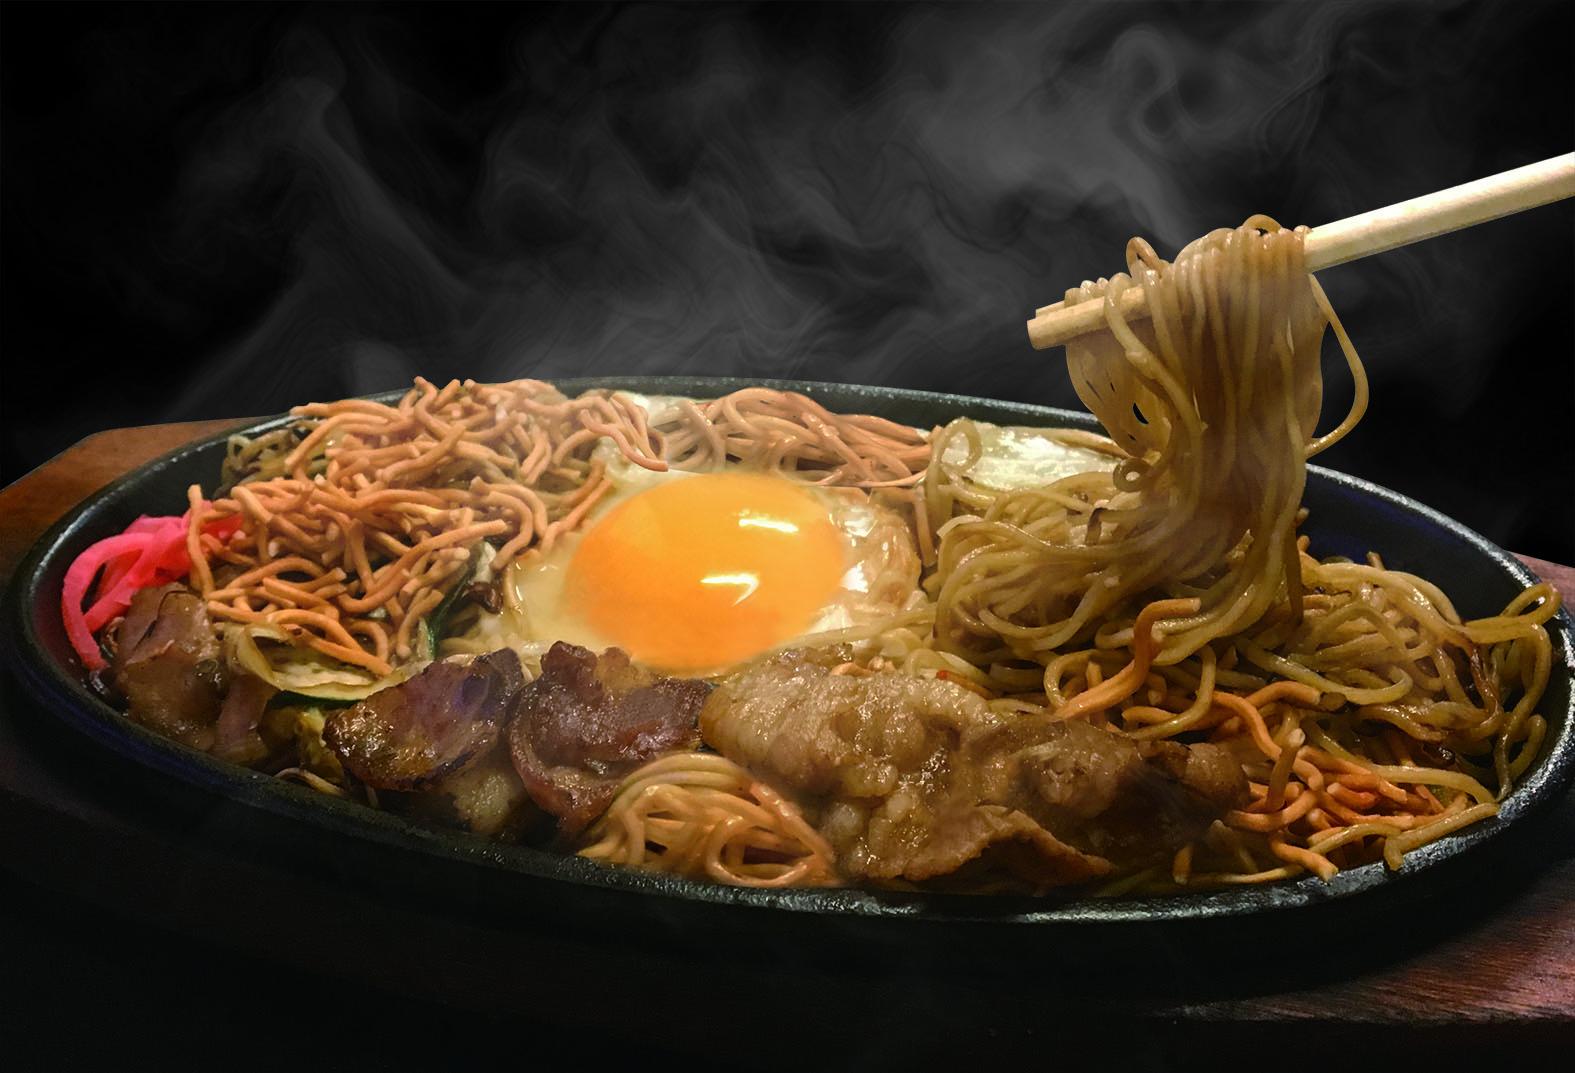 KENZO cafeの「博多焼きラーメン」の作り方